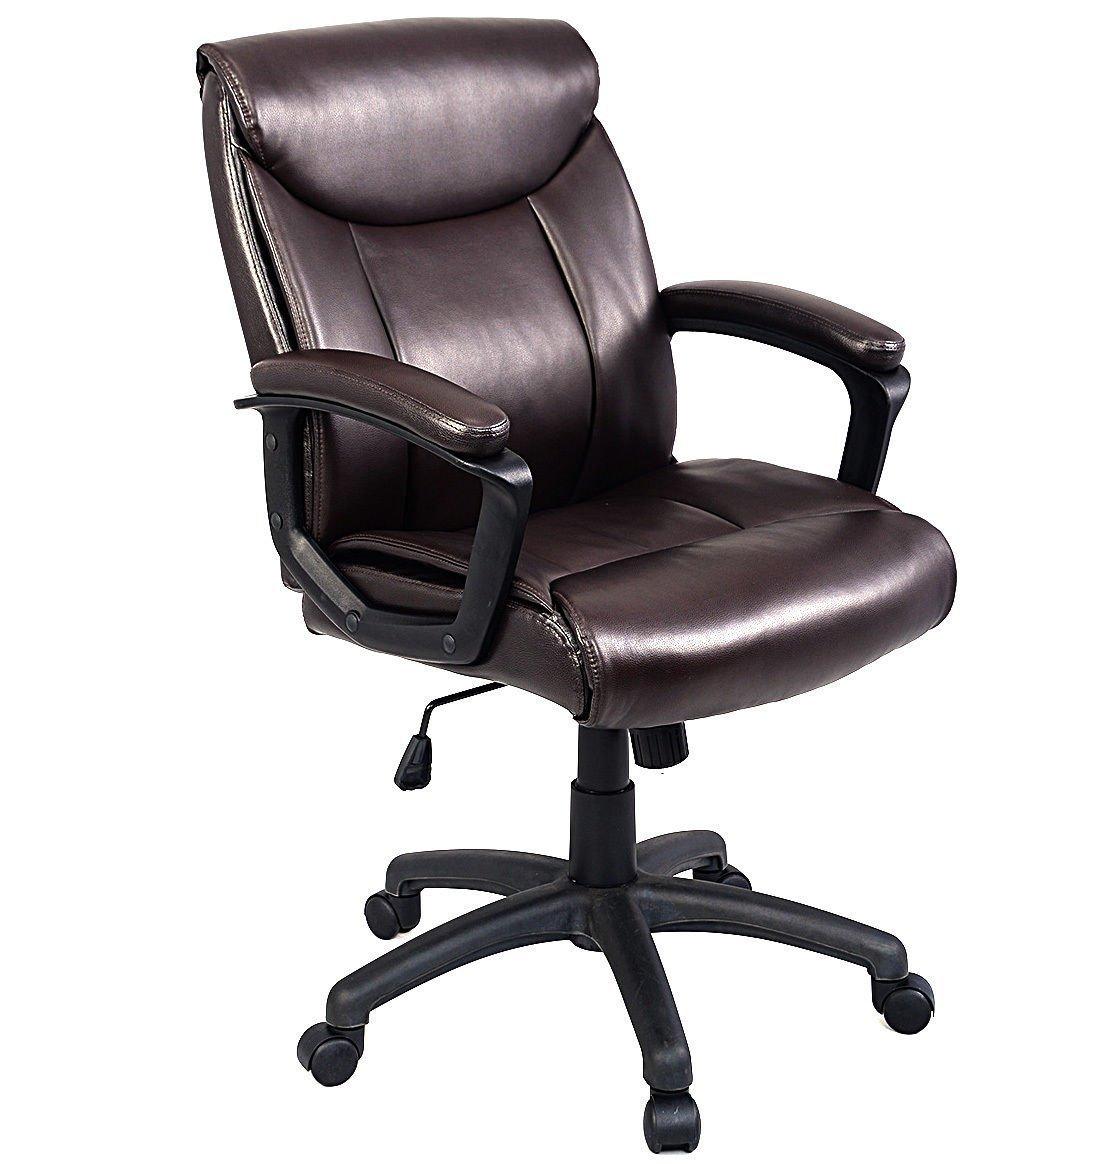 Giantex Ergonomic Pu Leather Mid Back Executive Computer